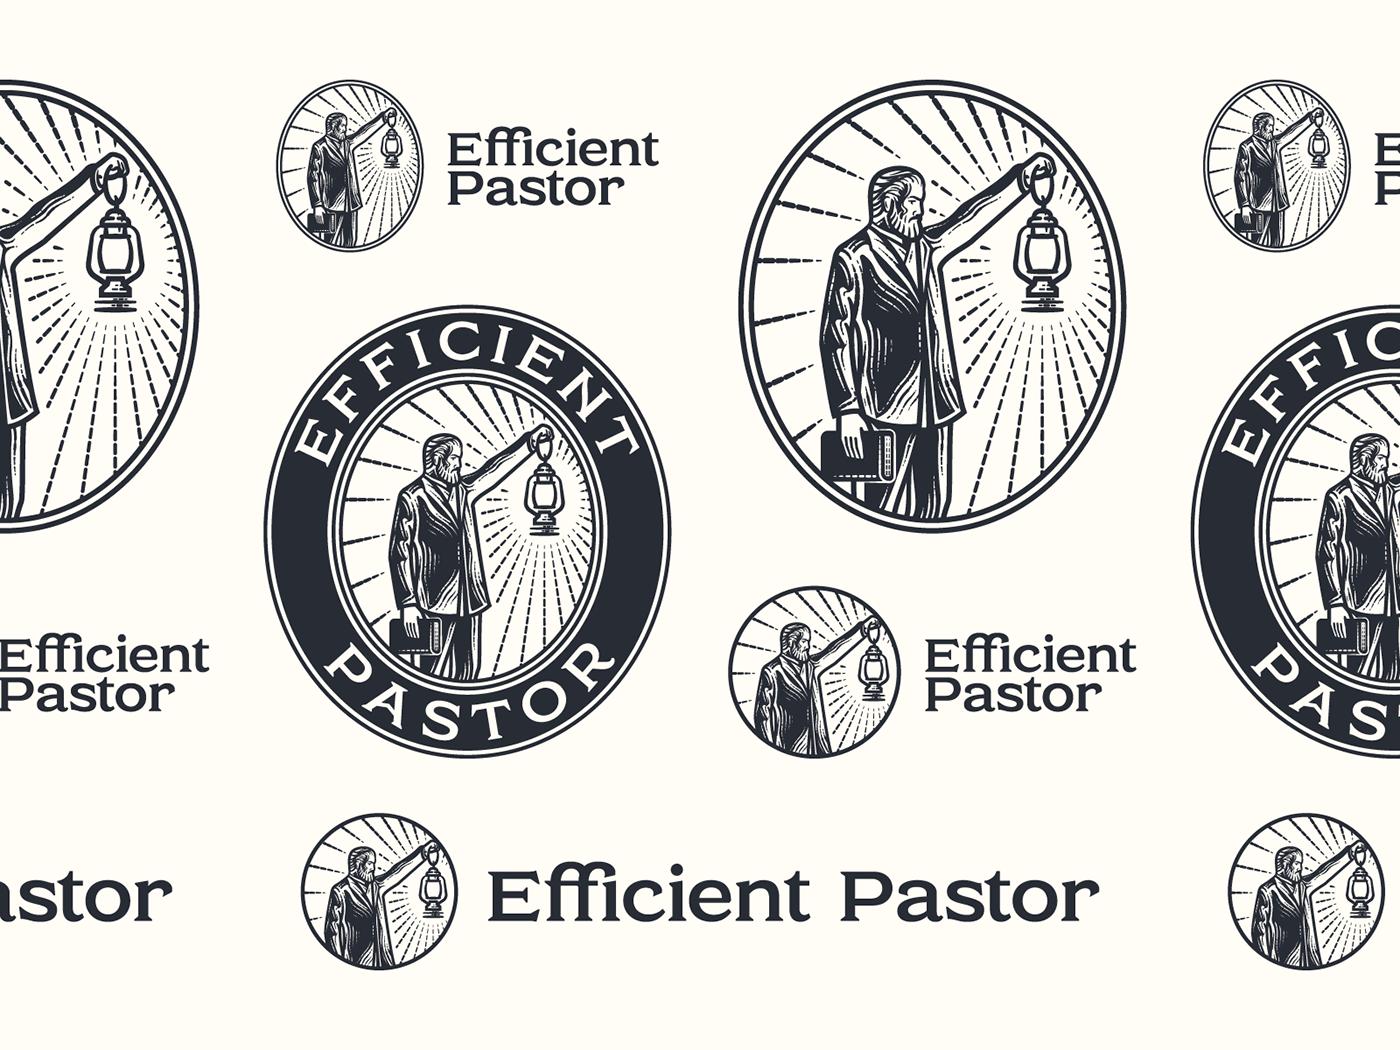 Efficient Pastor